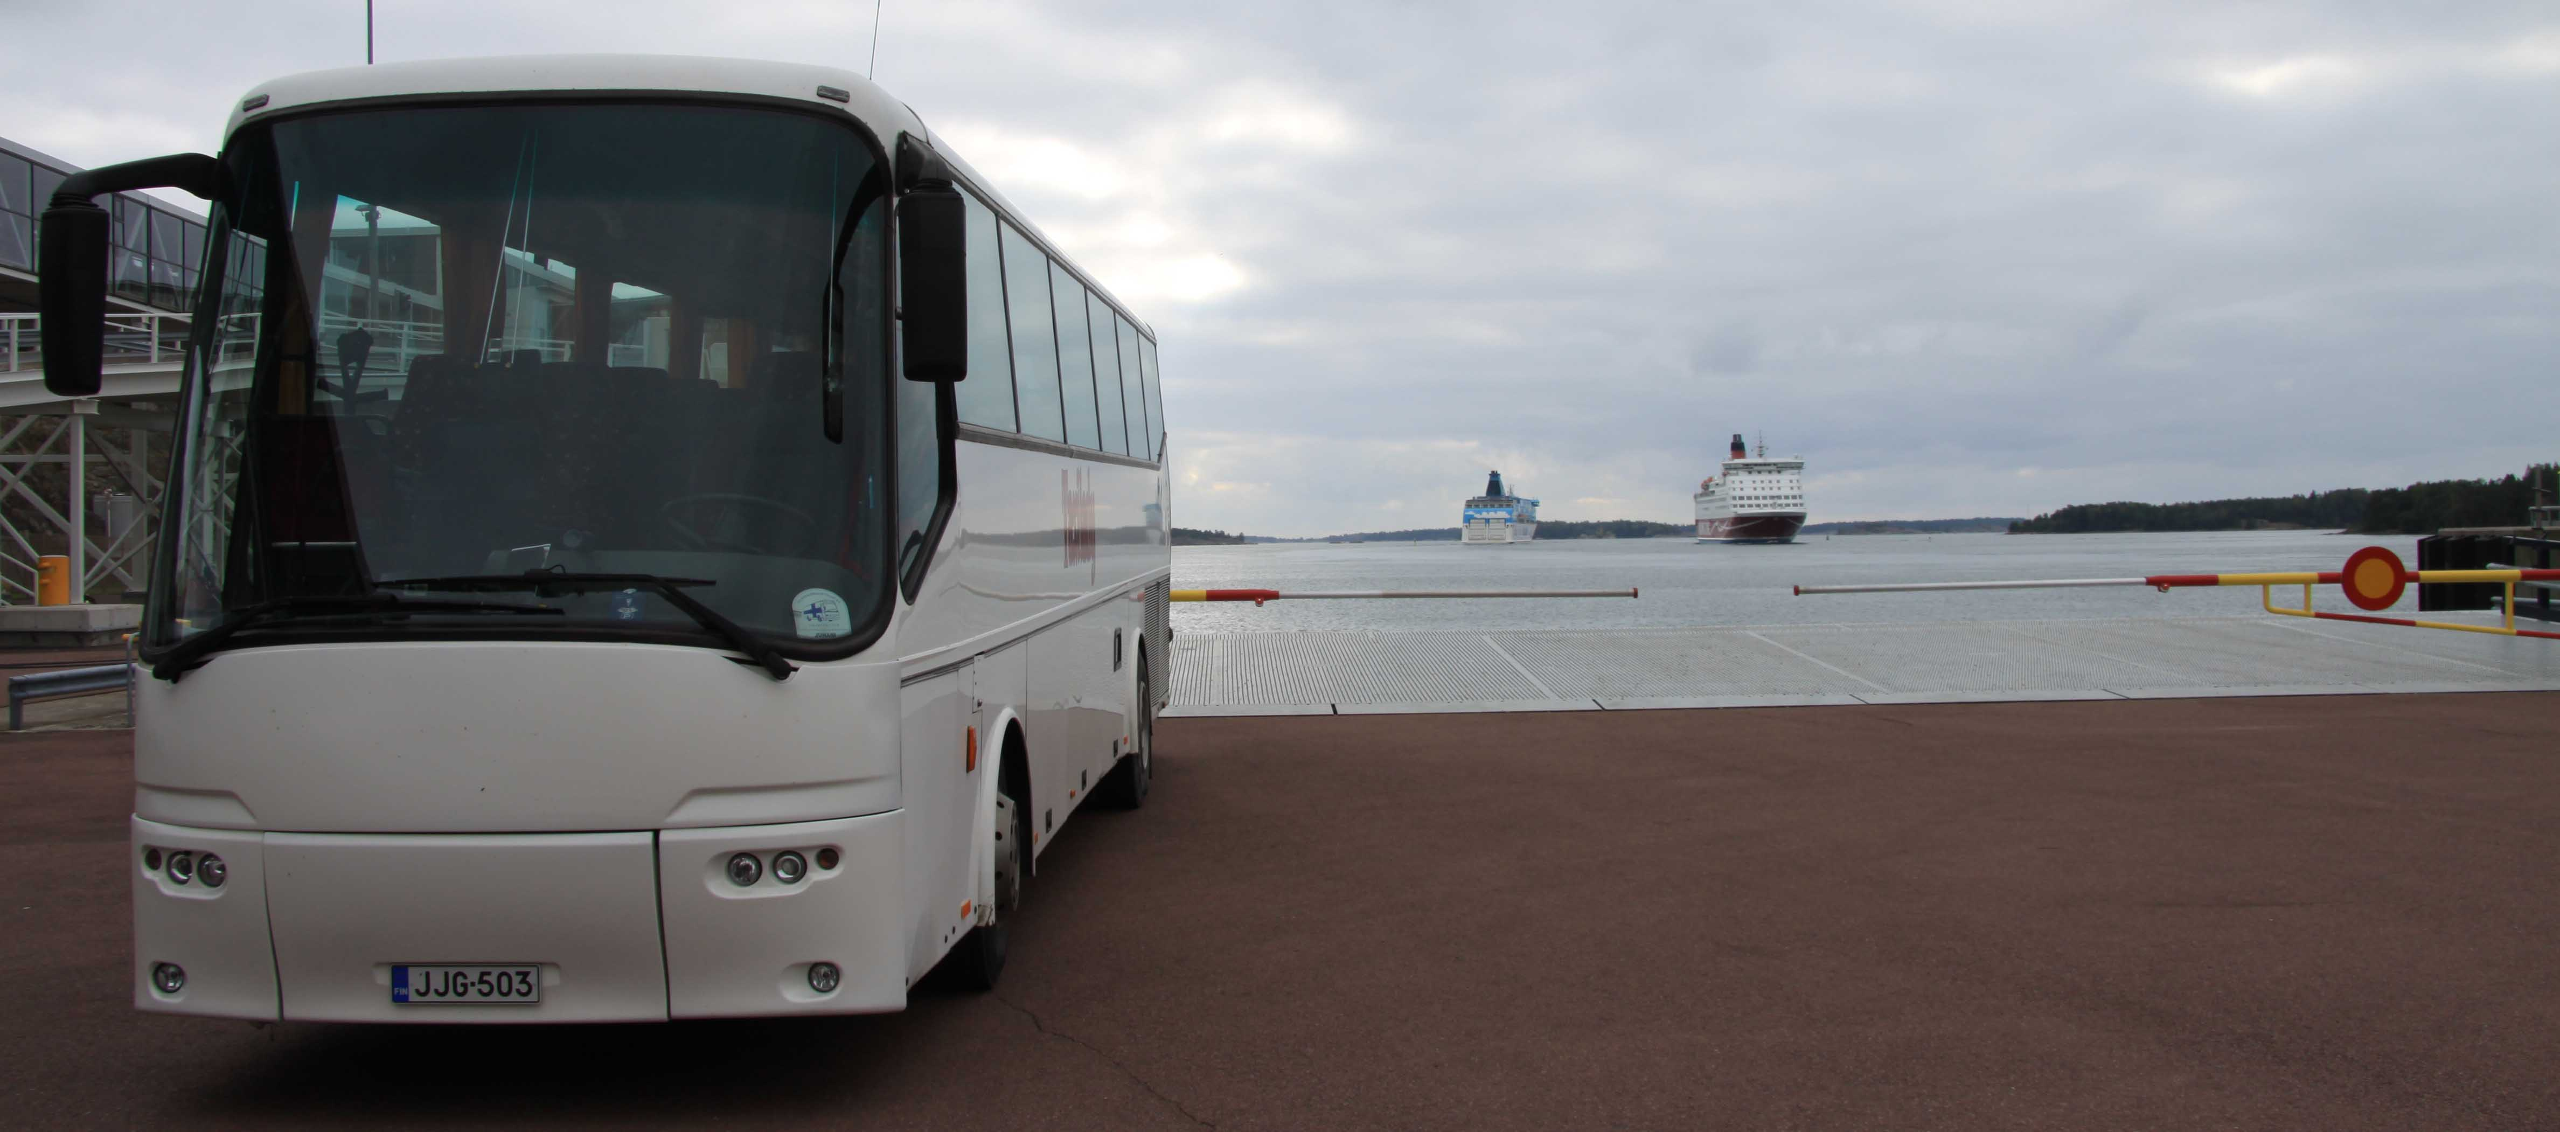 Bussilla Helsingin Satamaan